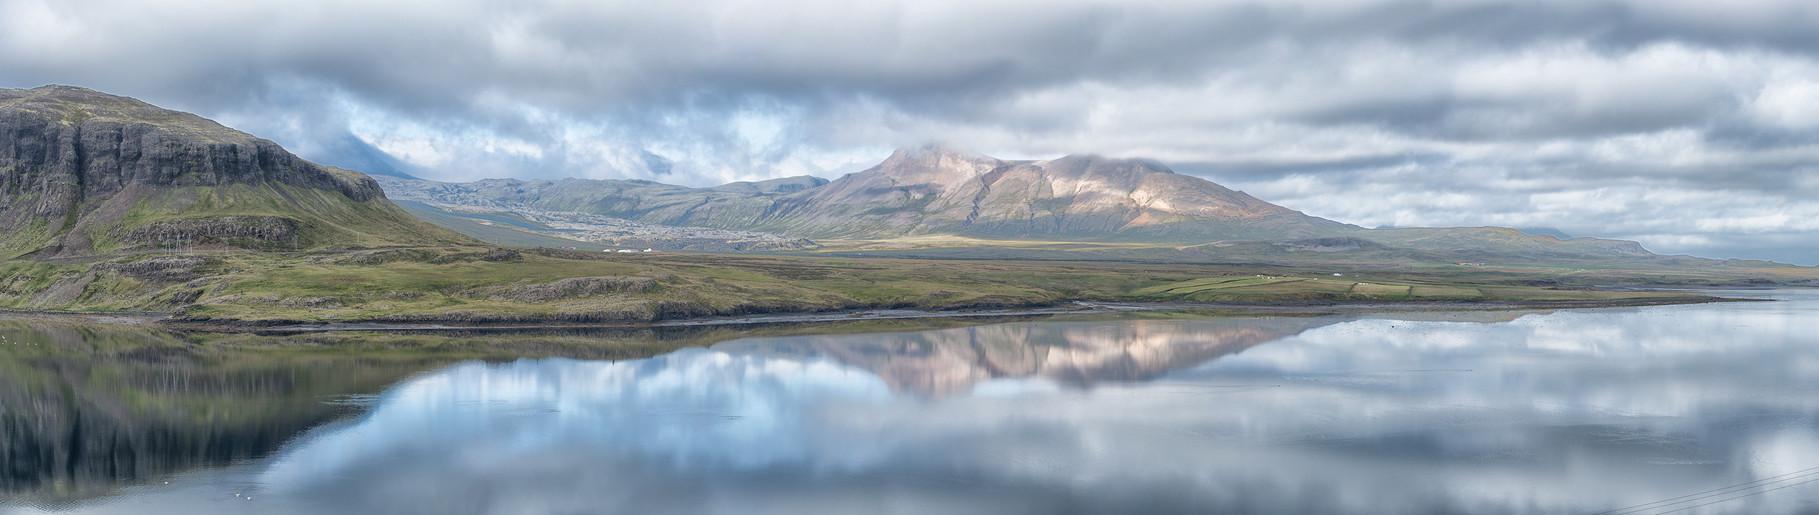 Panorama auf der Snaefellshalbinsel